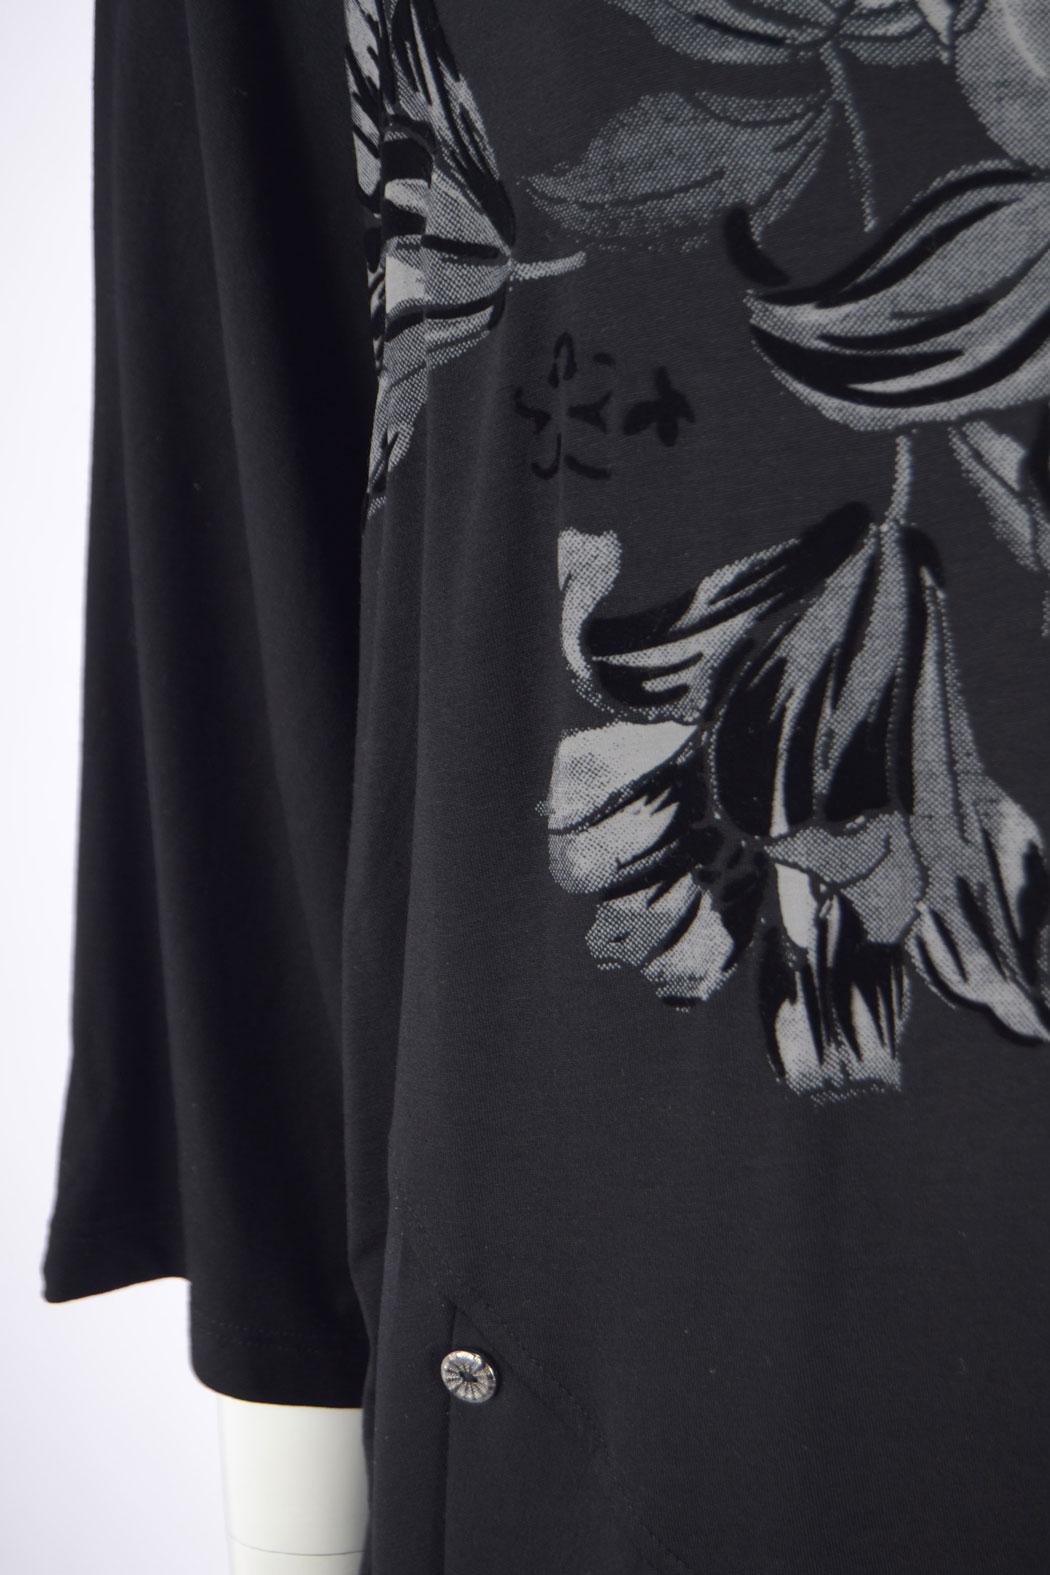 ed235b3a77bd AKH Damen Tunika Longshirt mit Blumen-Muster aus Viskose Schwarz 44 4,  79,90 €